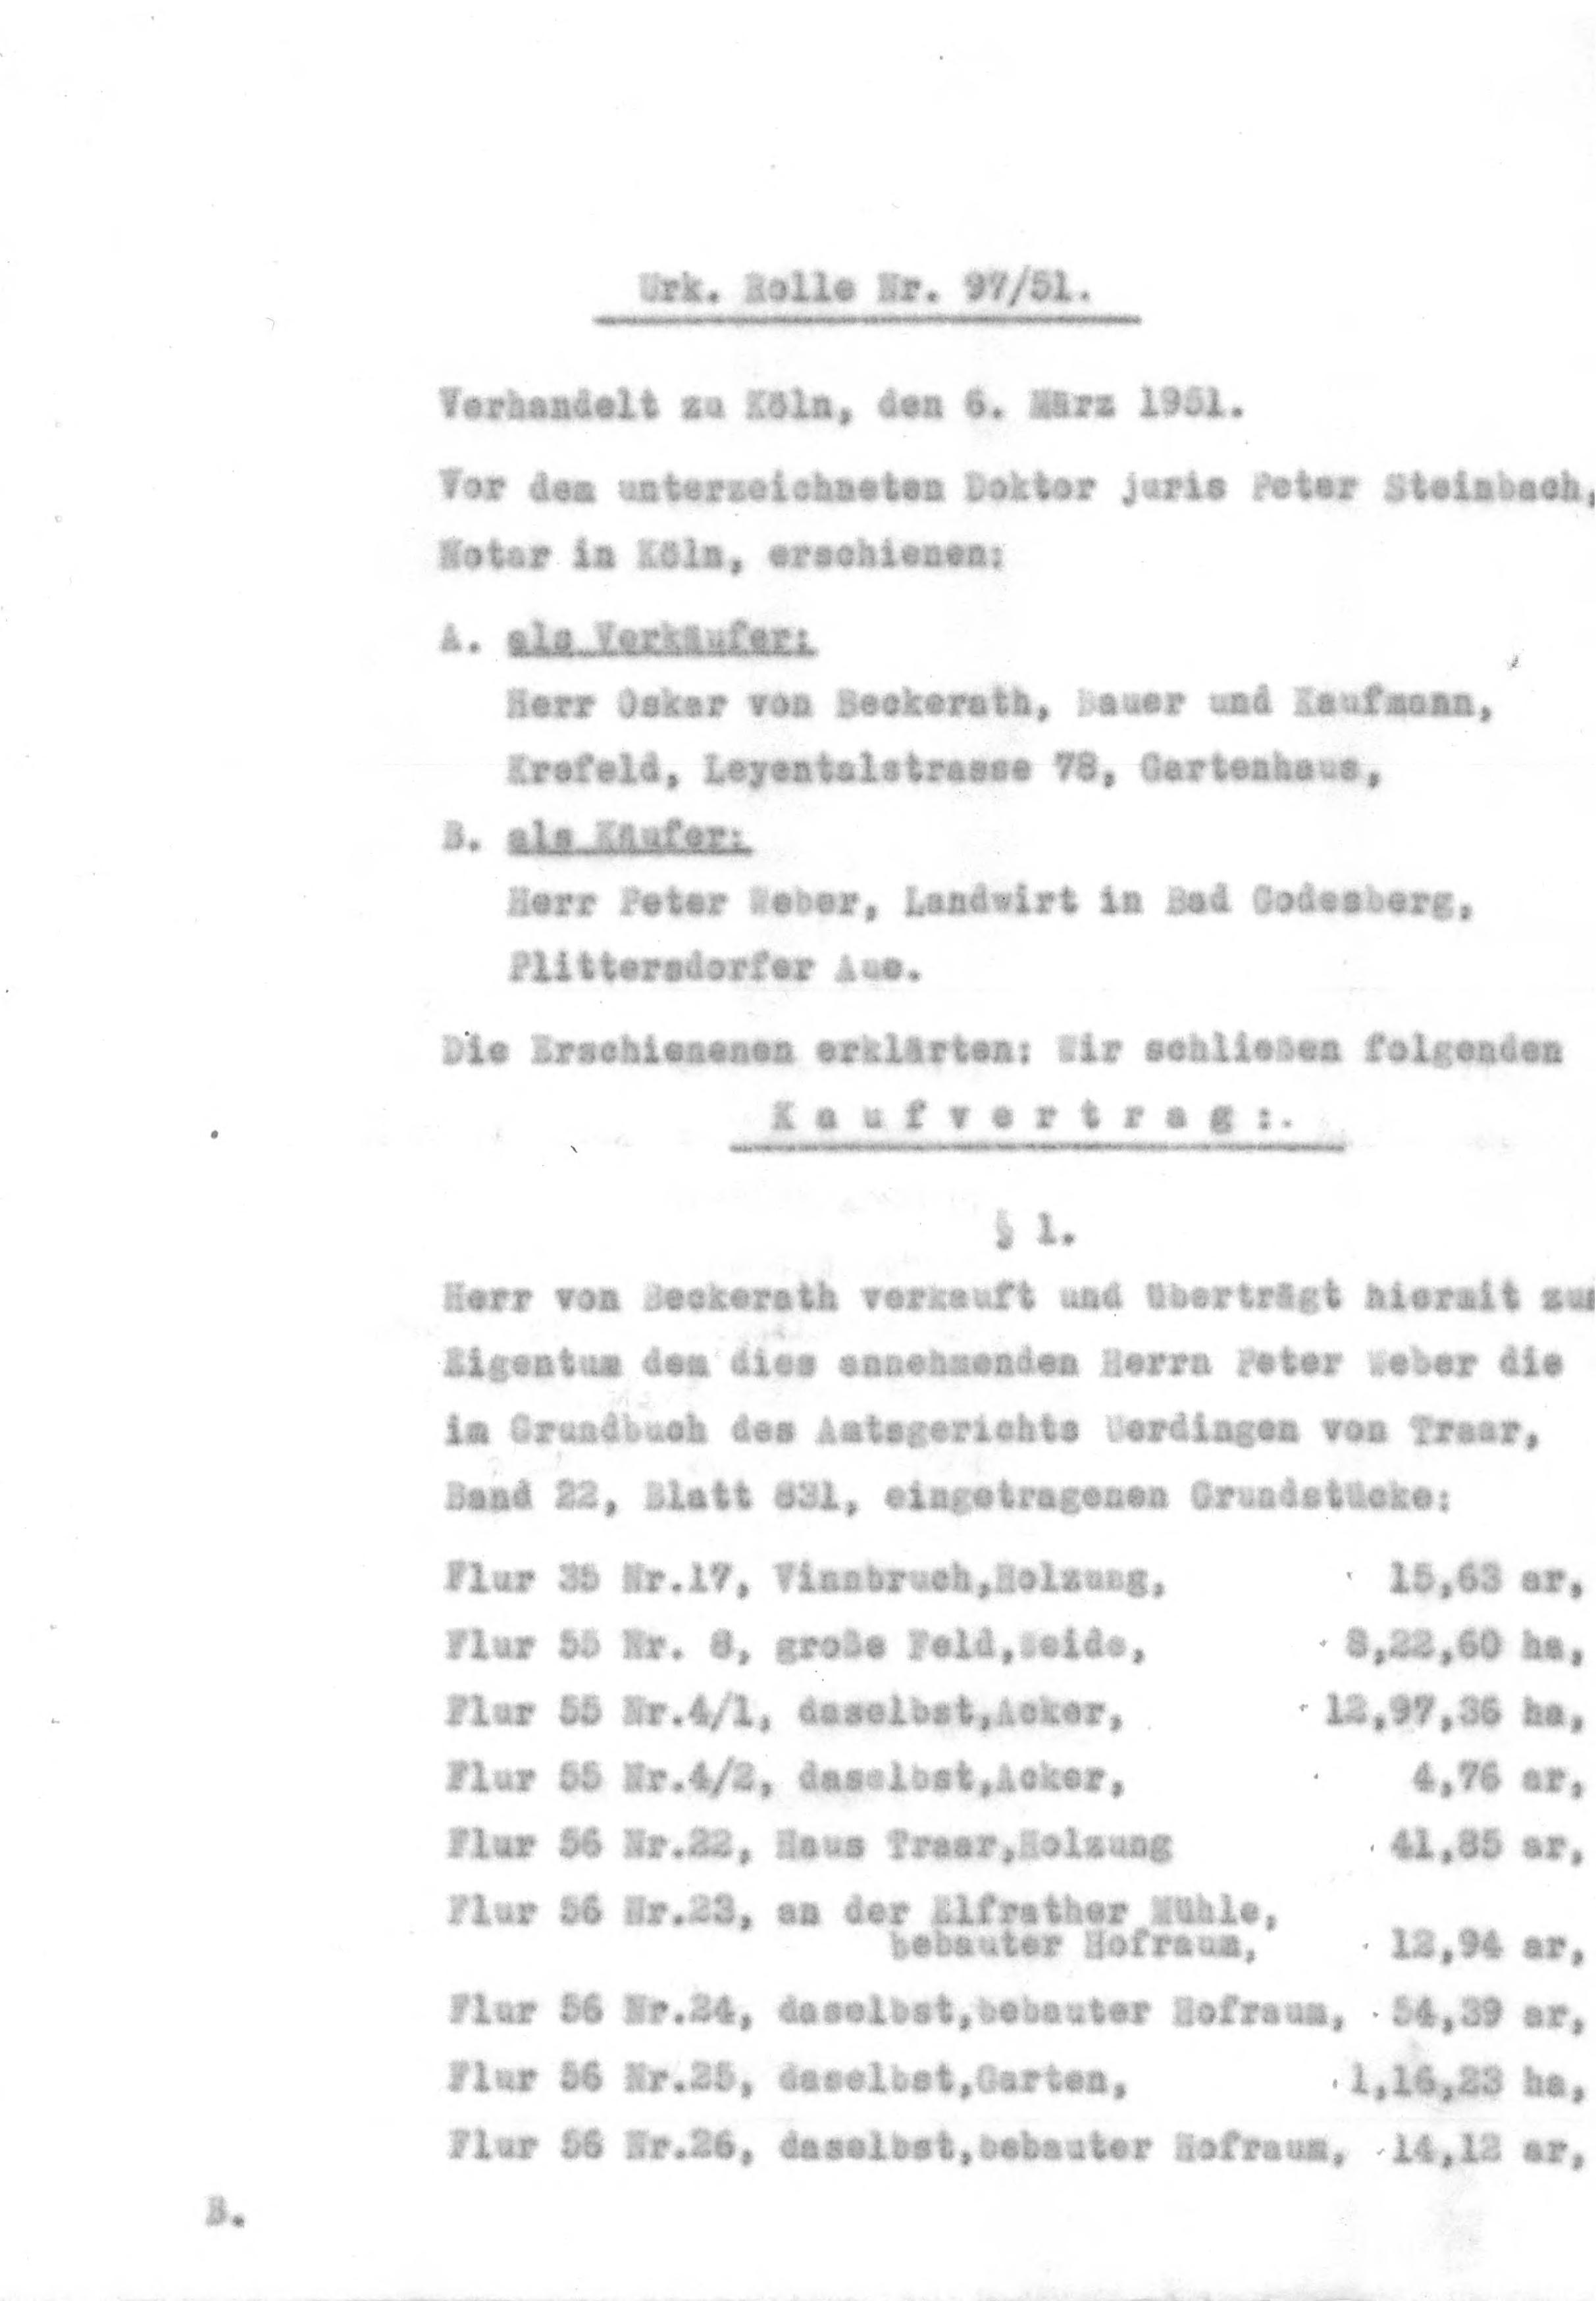 Datei:Kaufvertrag Haus Traar 1951.djvu – Wikipedia